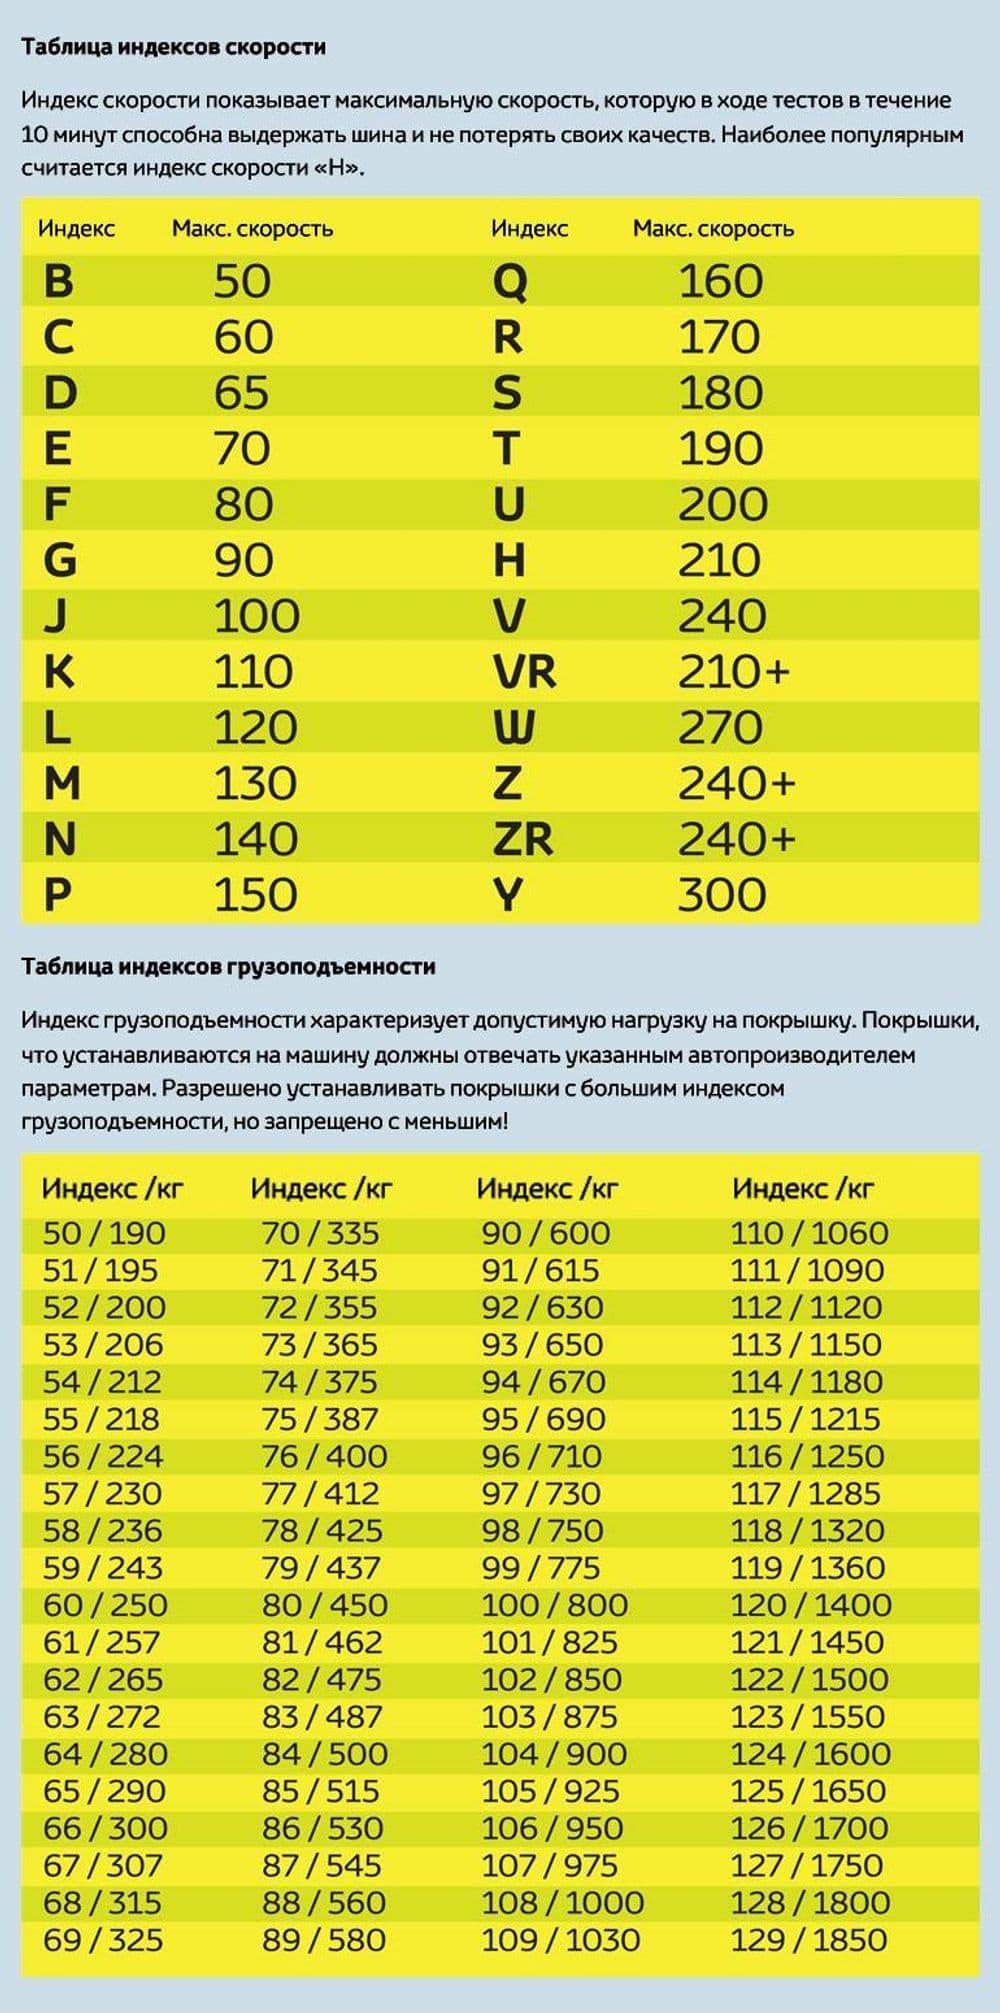 Индексы нагрузки и скорости